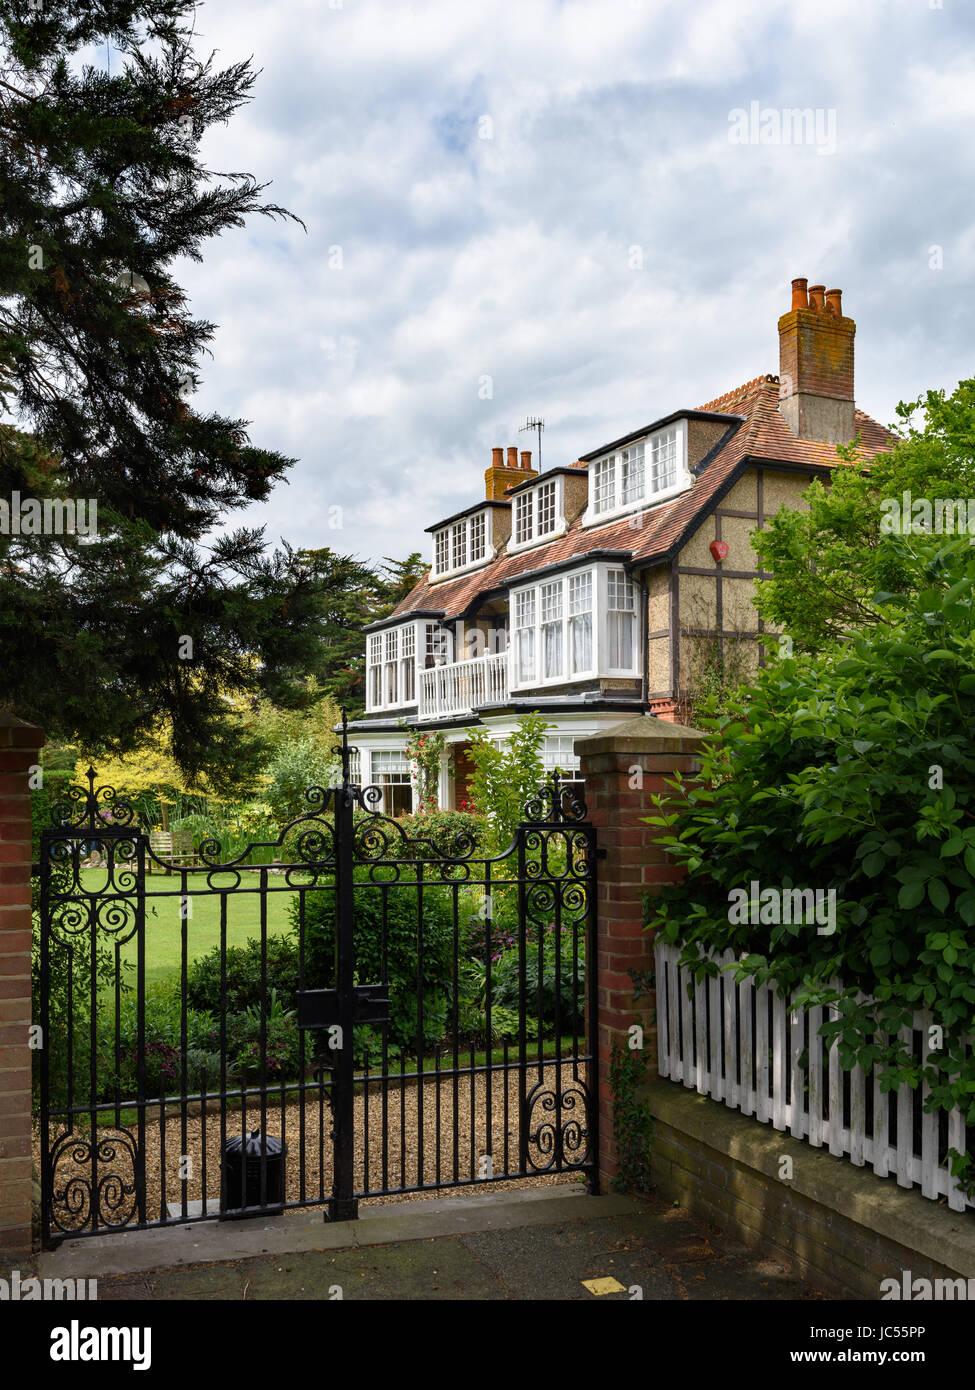 Detached House, Isle of Wight, UK - Stock Image